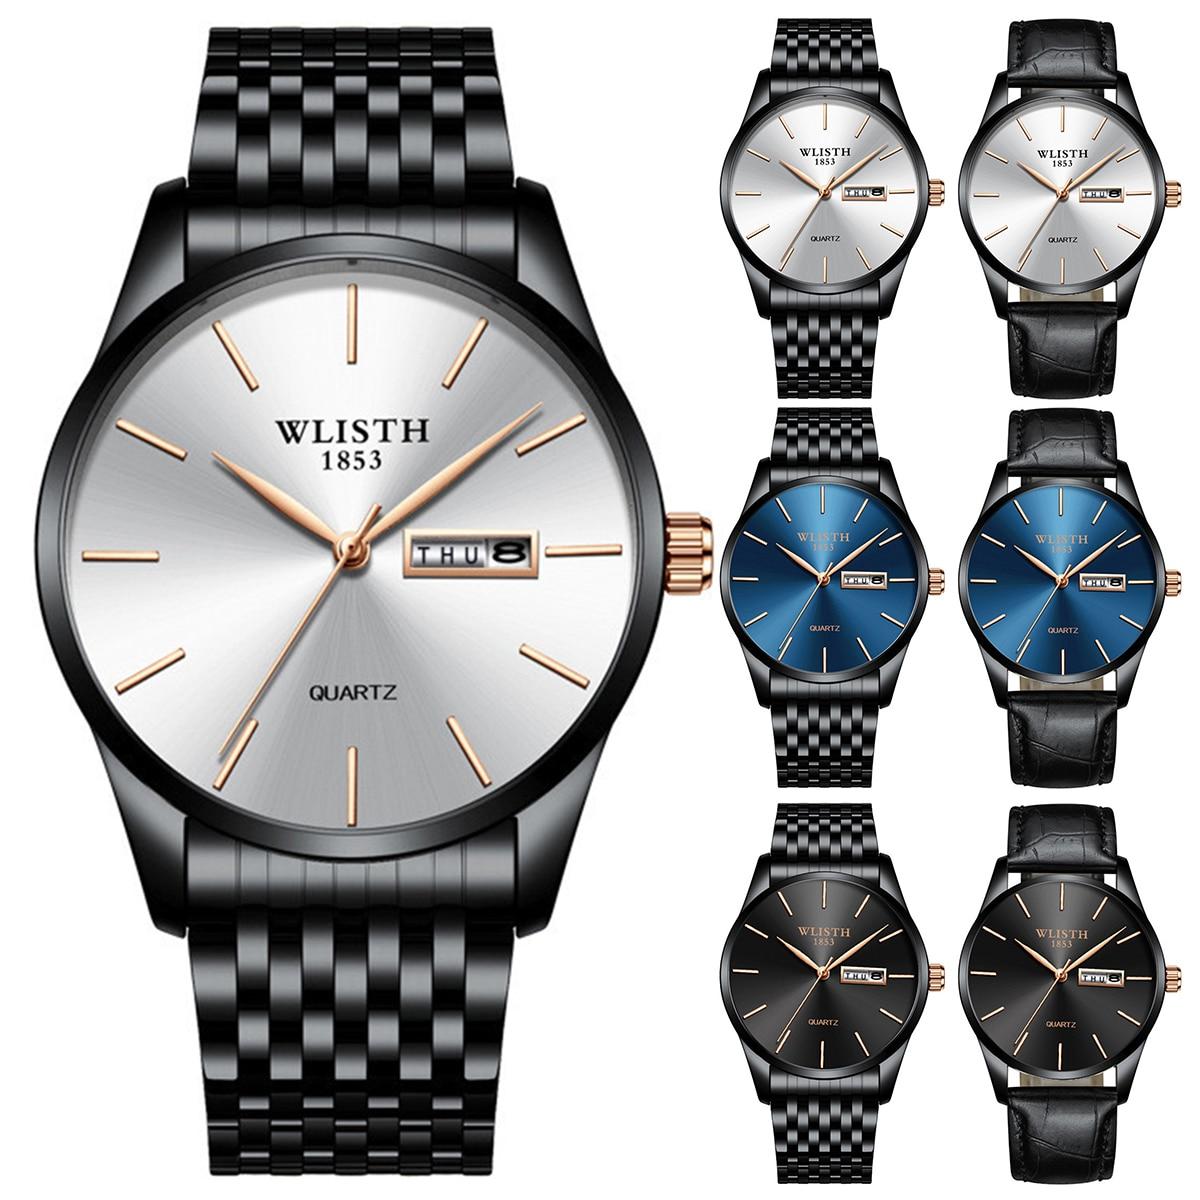 5 color Men Luxury Business Watch Ultra-thin Week Date Display Waterproof Analog Quartz Wrist Watch 2019